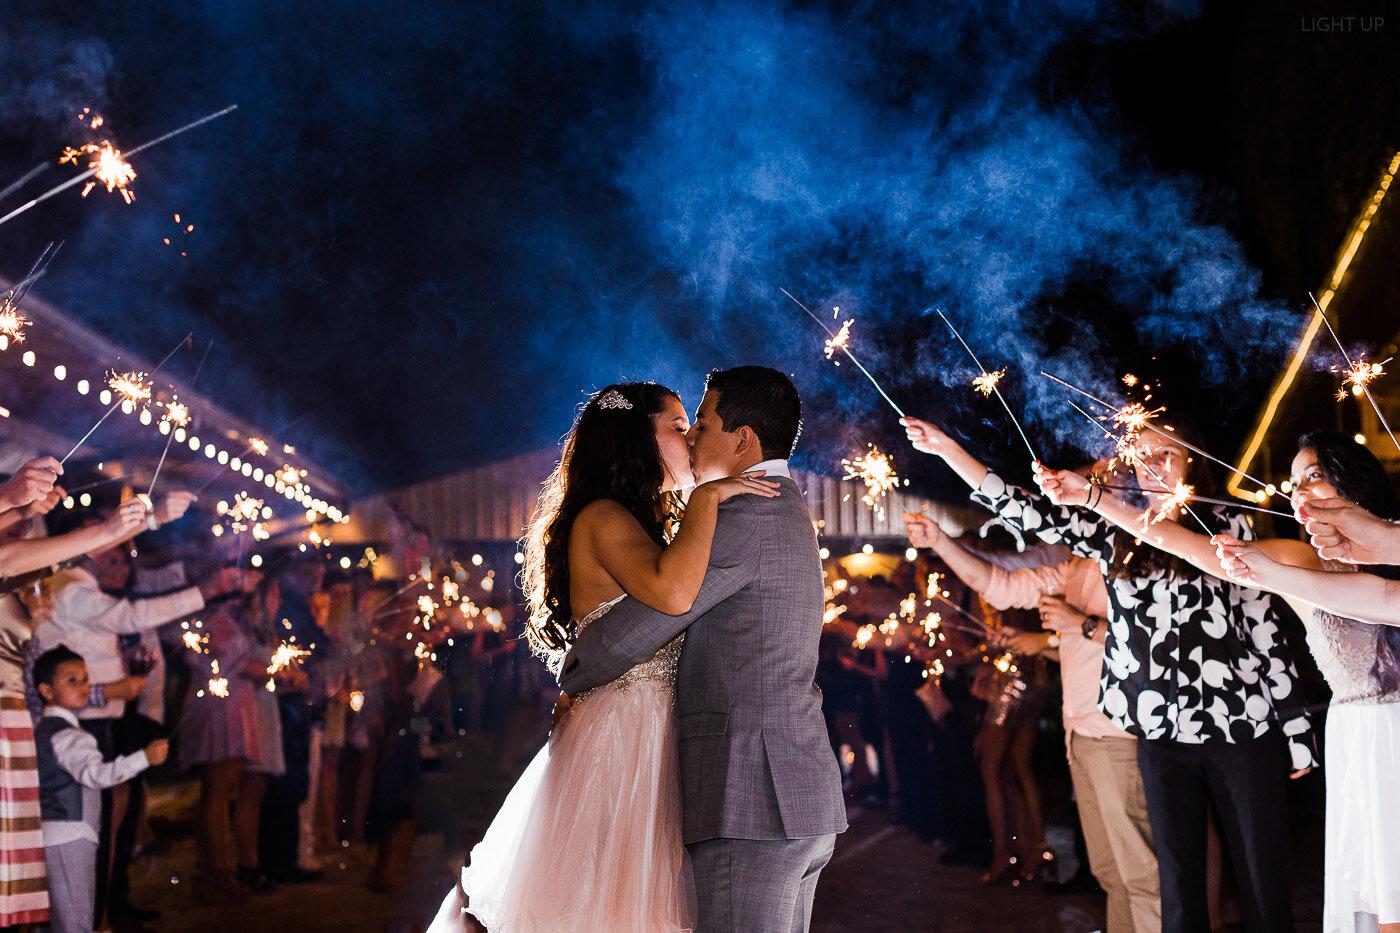 Lakeland-barn-wedding-at-white-horse-ranch-126.jpg